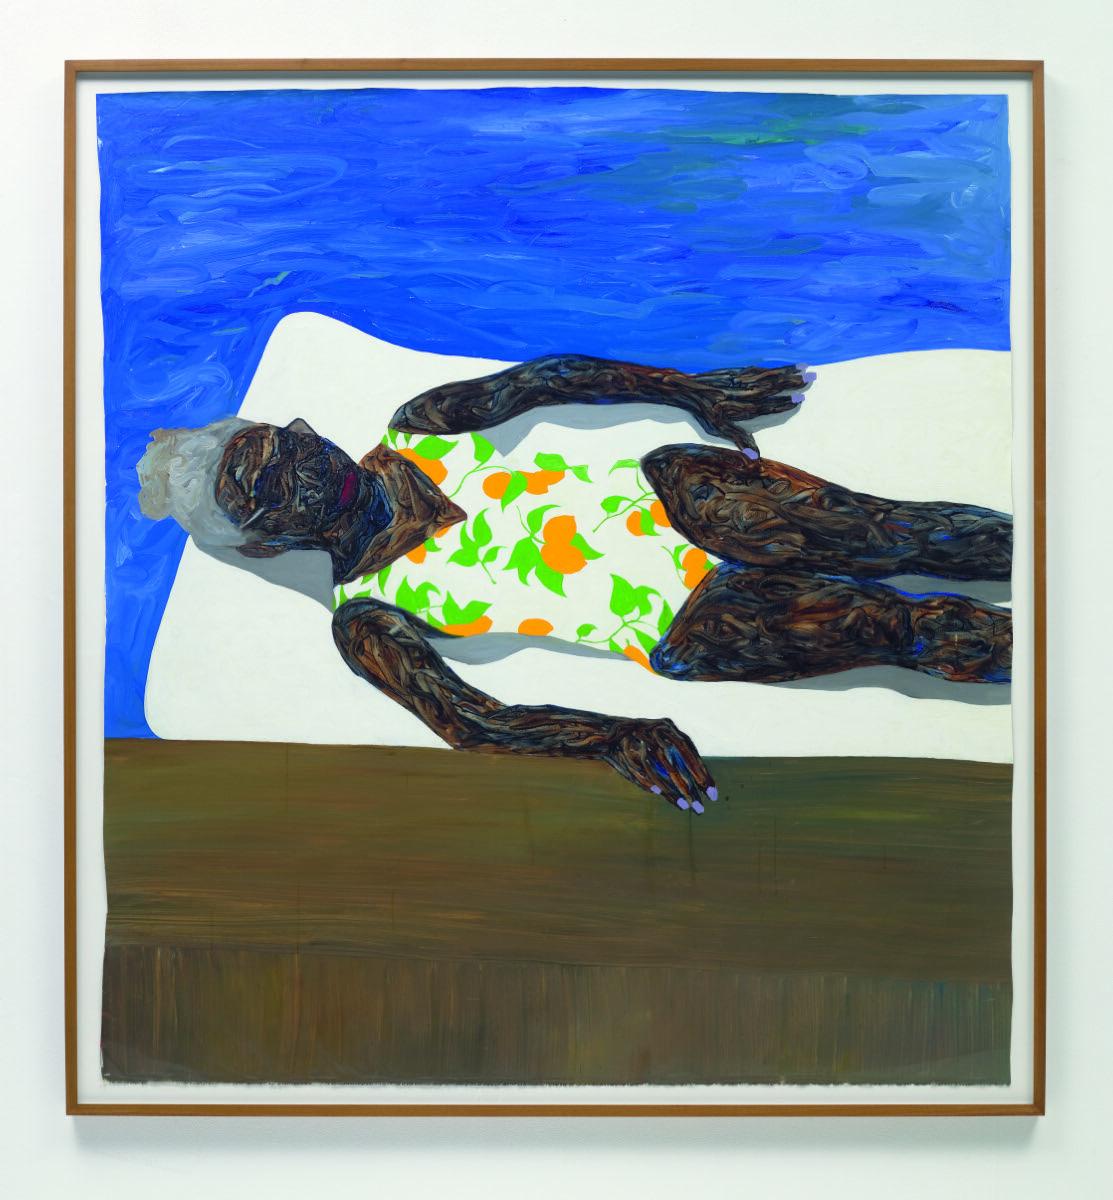 Amoako Boafo, The Lemon Bathing Suit, 2019. Courtesy of Phillips.